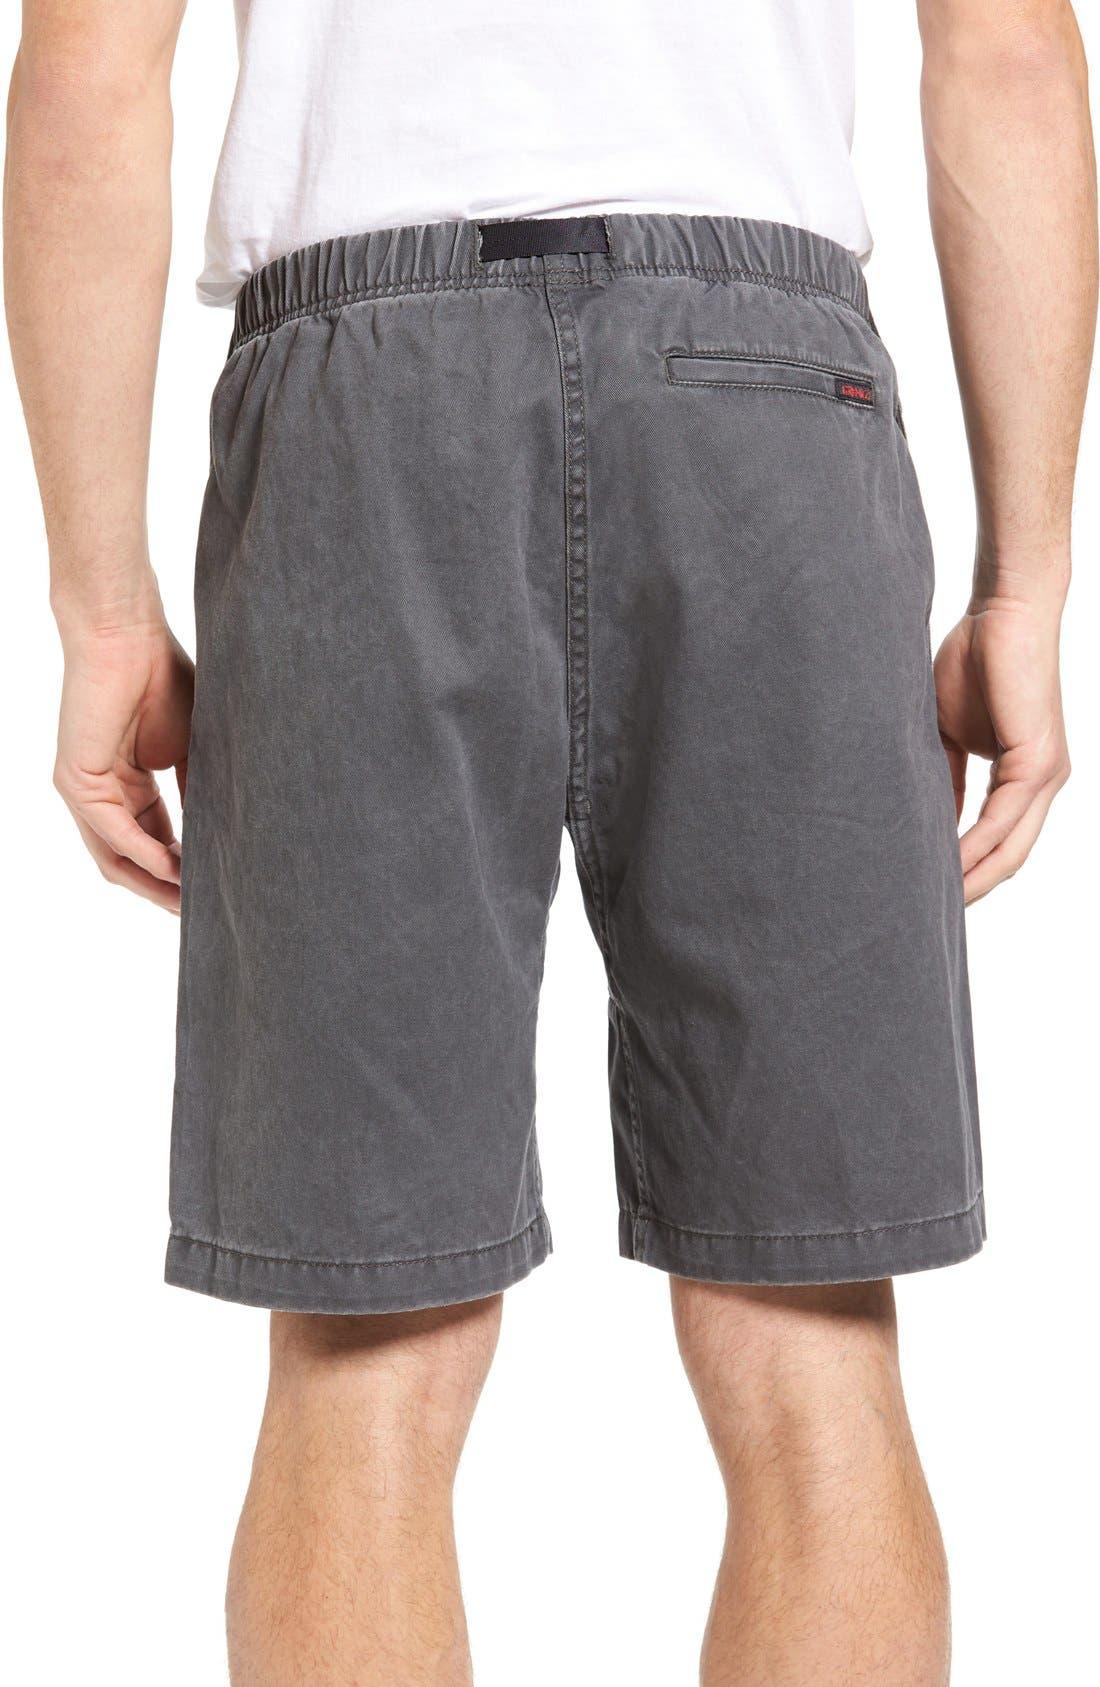 Rockin Sport Shorts,                             Alternate thumbnail 2, color,                             Asphalt Grey